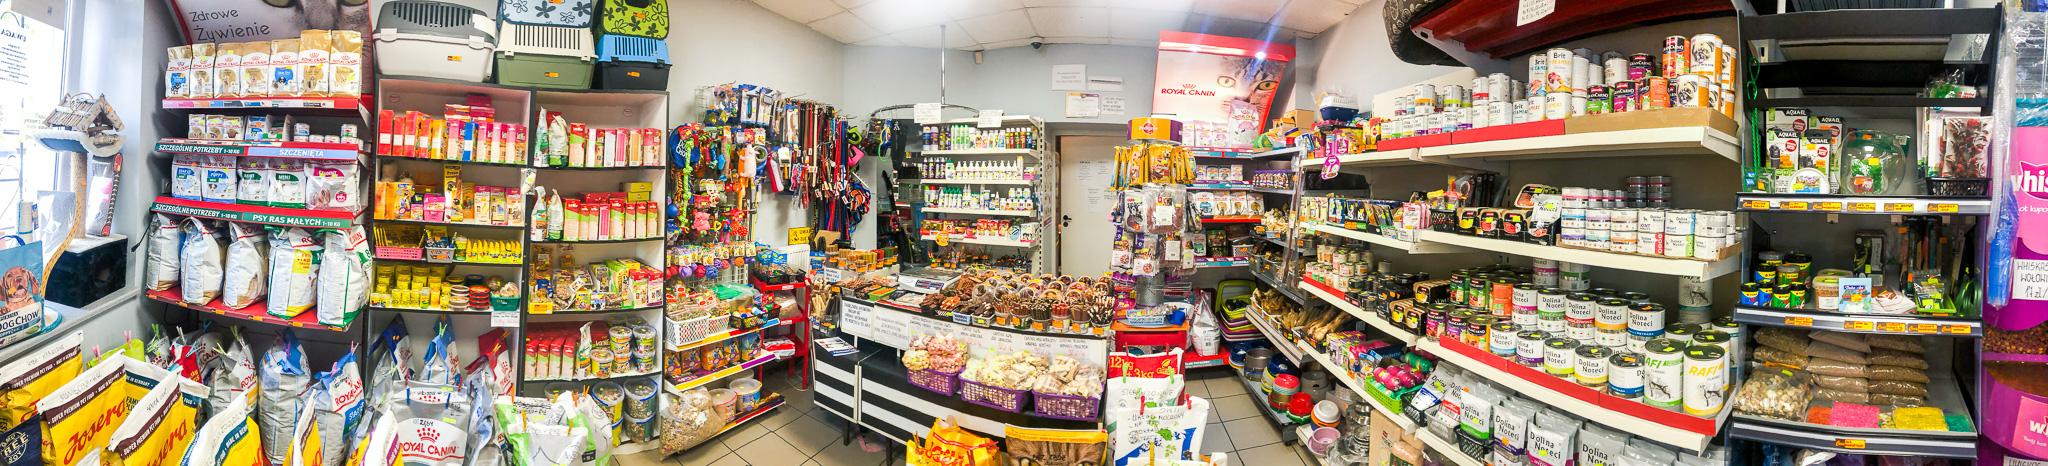 sklep zoologiczny Alanis - Lessie - panorama